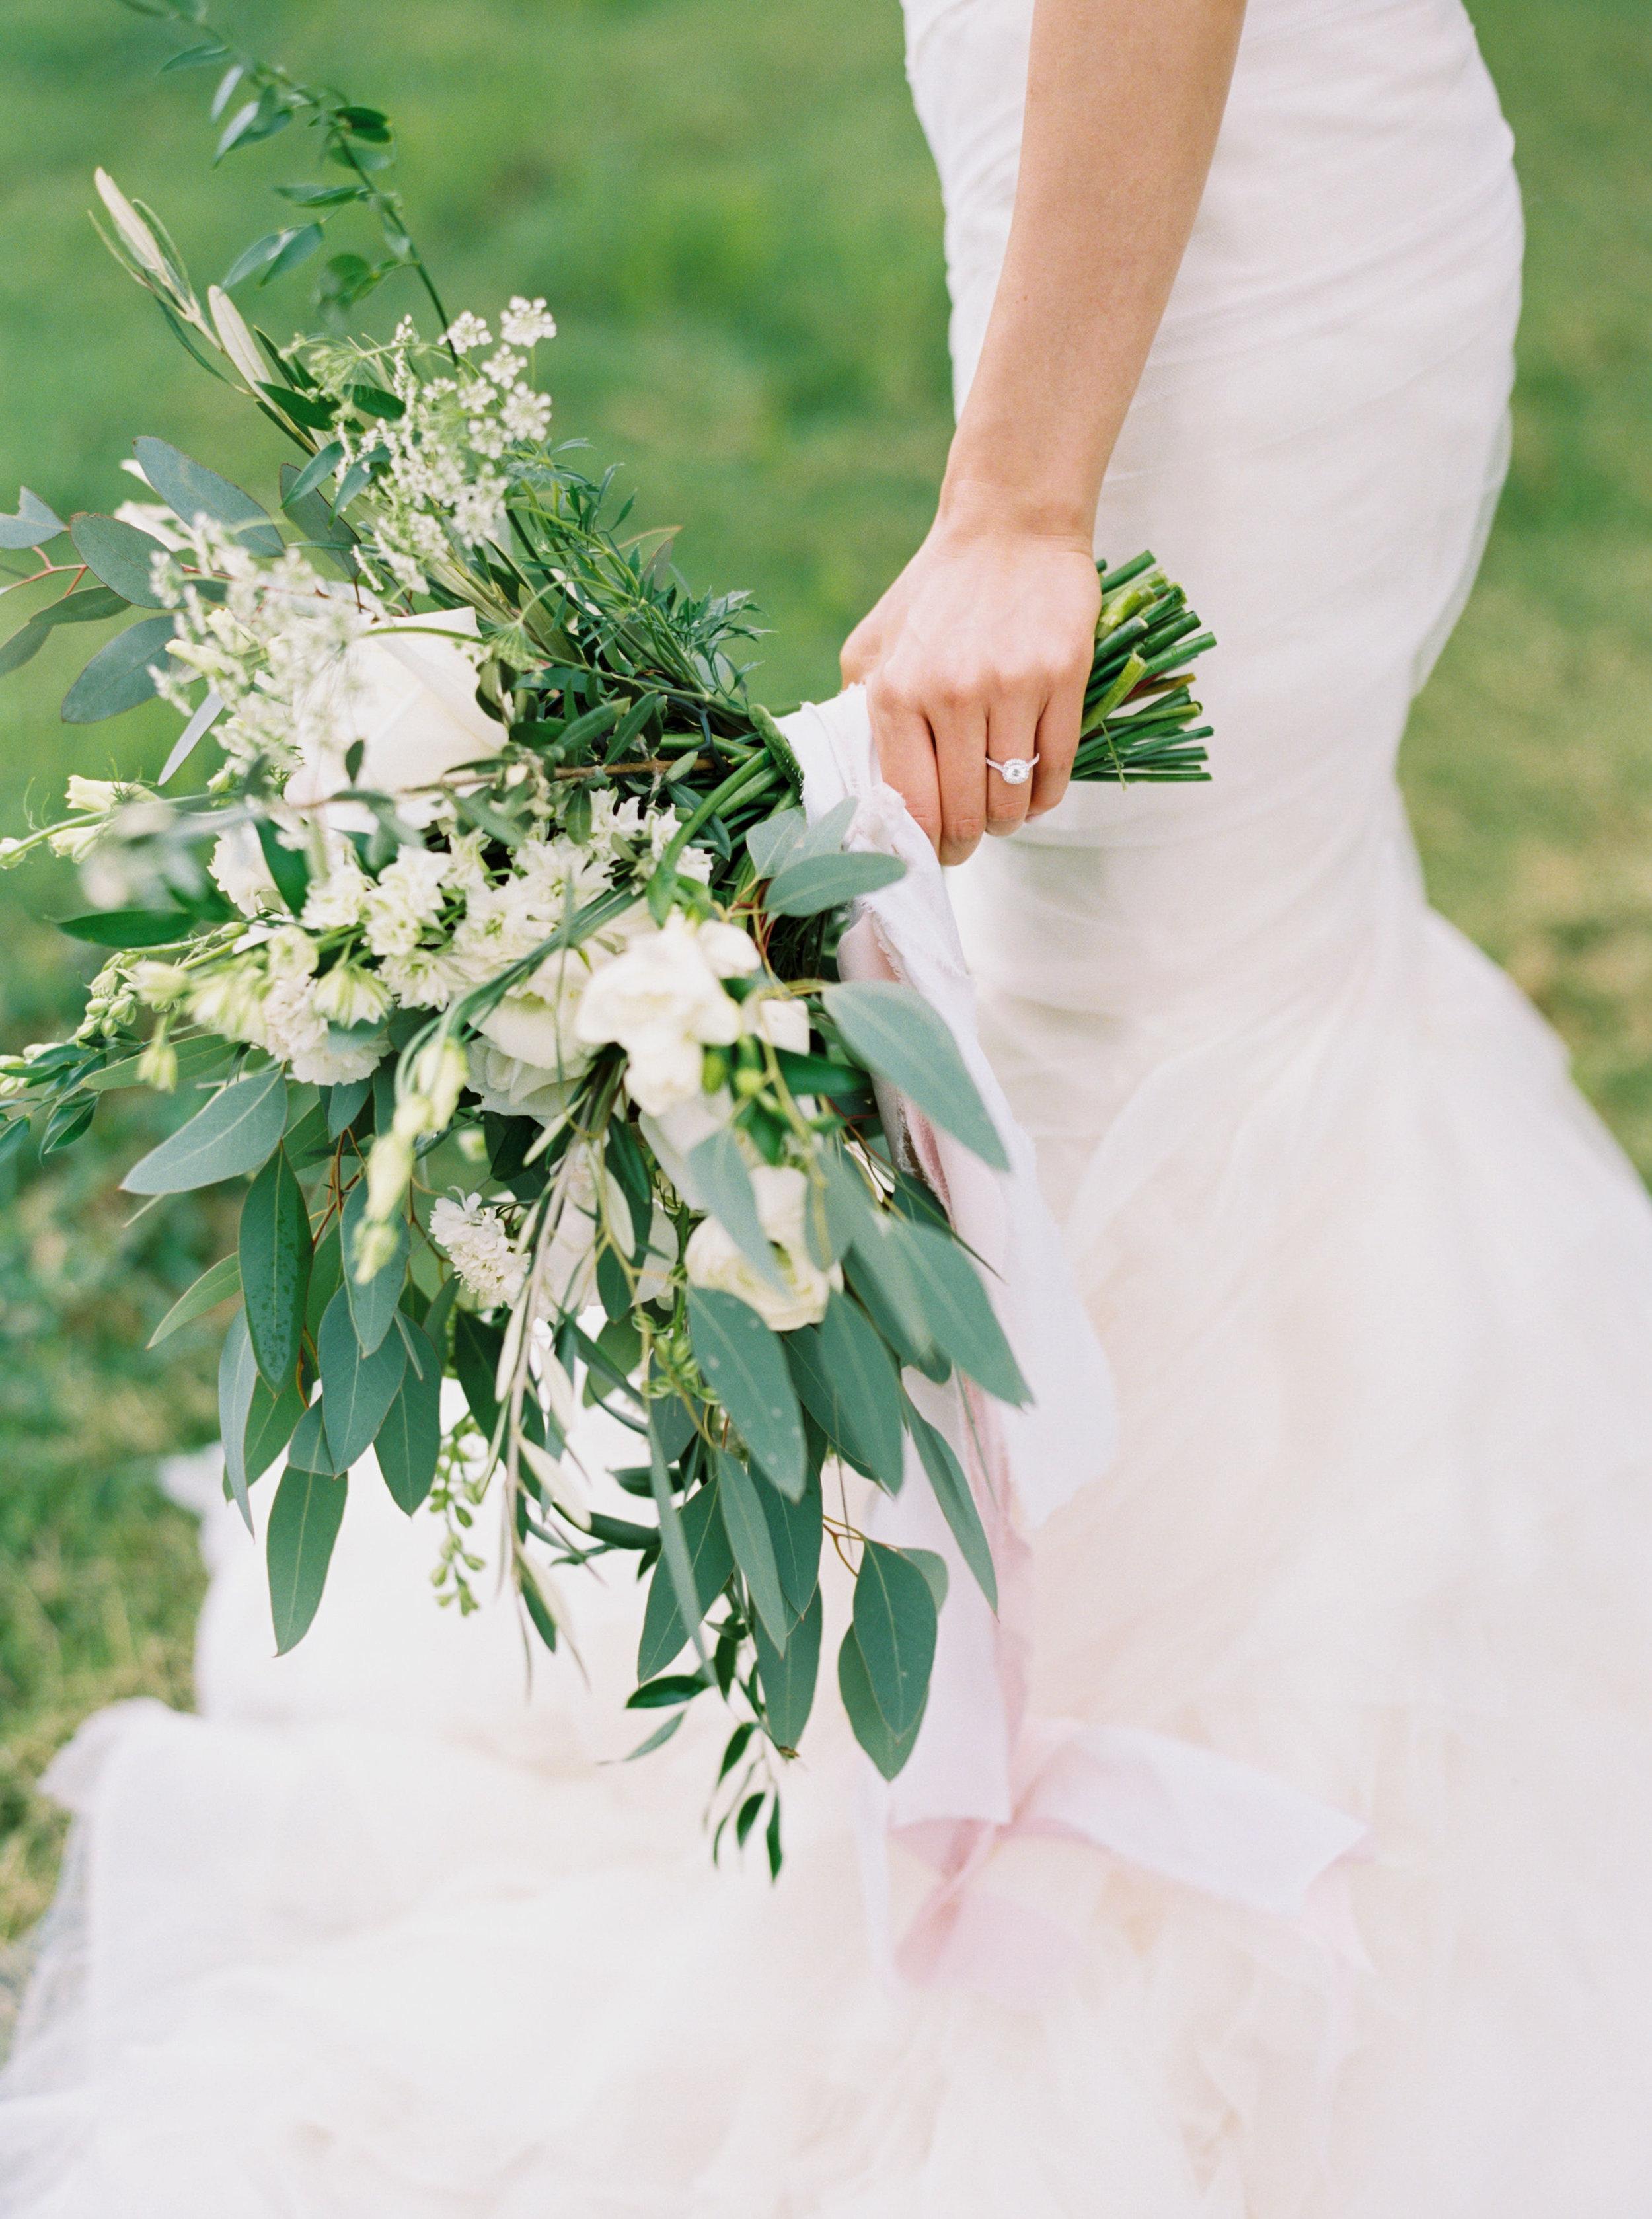 Fionnie_Jacob_Marblegate_Farm_Wedding_Knoxville_Abigail_Malone_Photography-331.jpeg